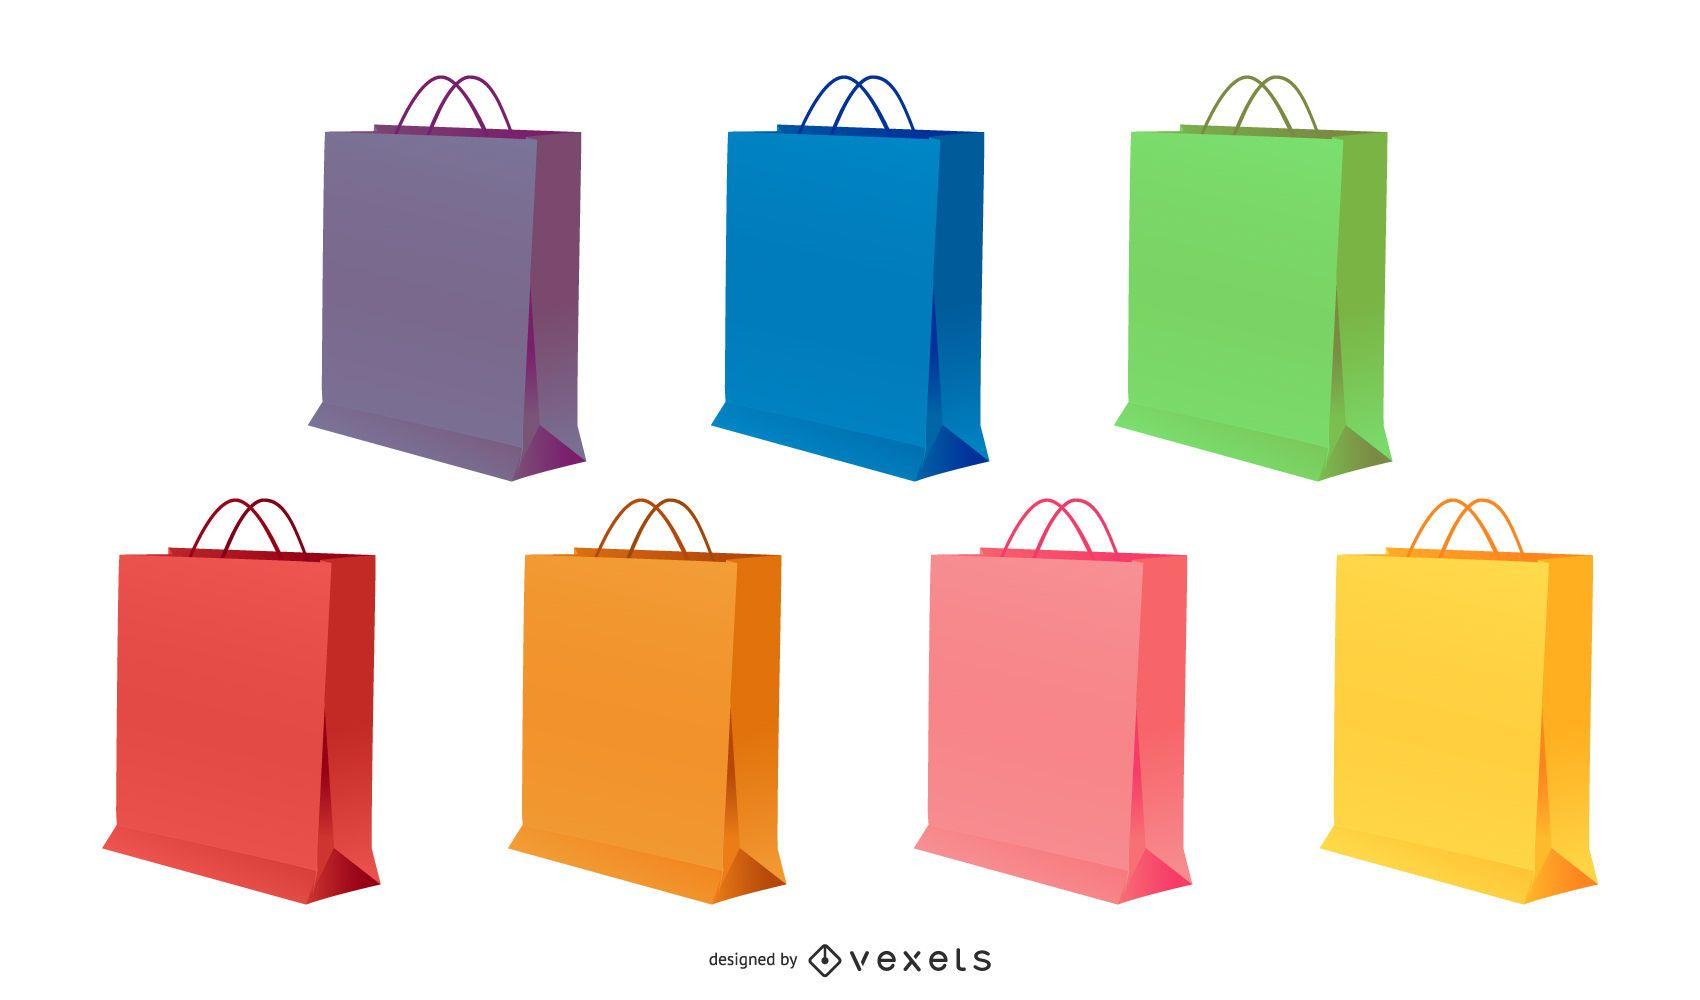 colored paper bags illustration set